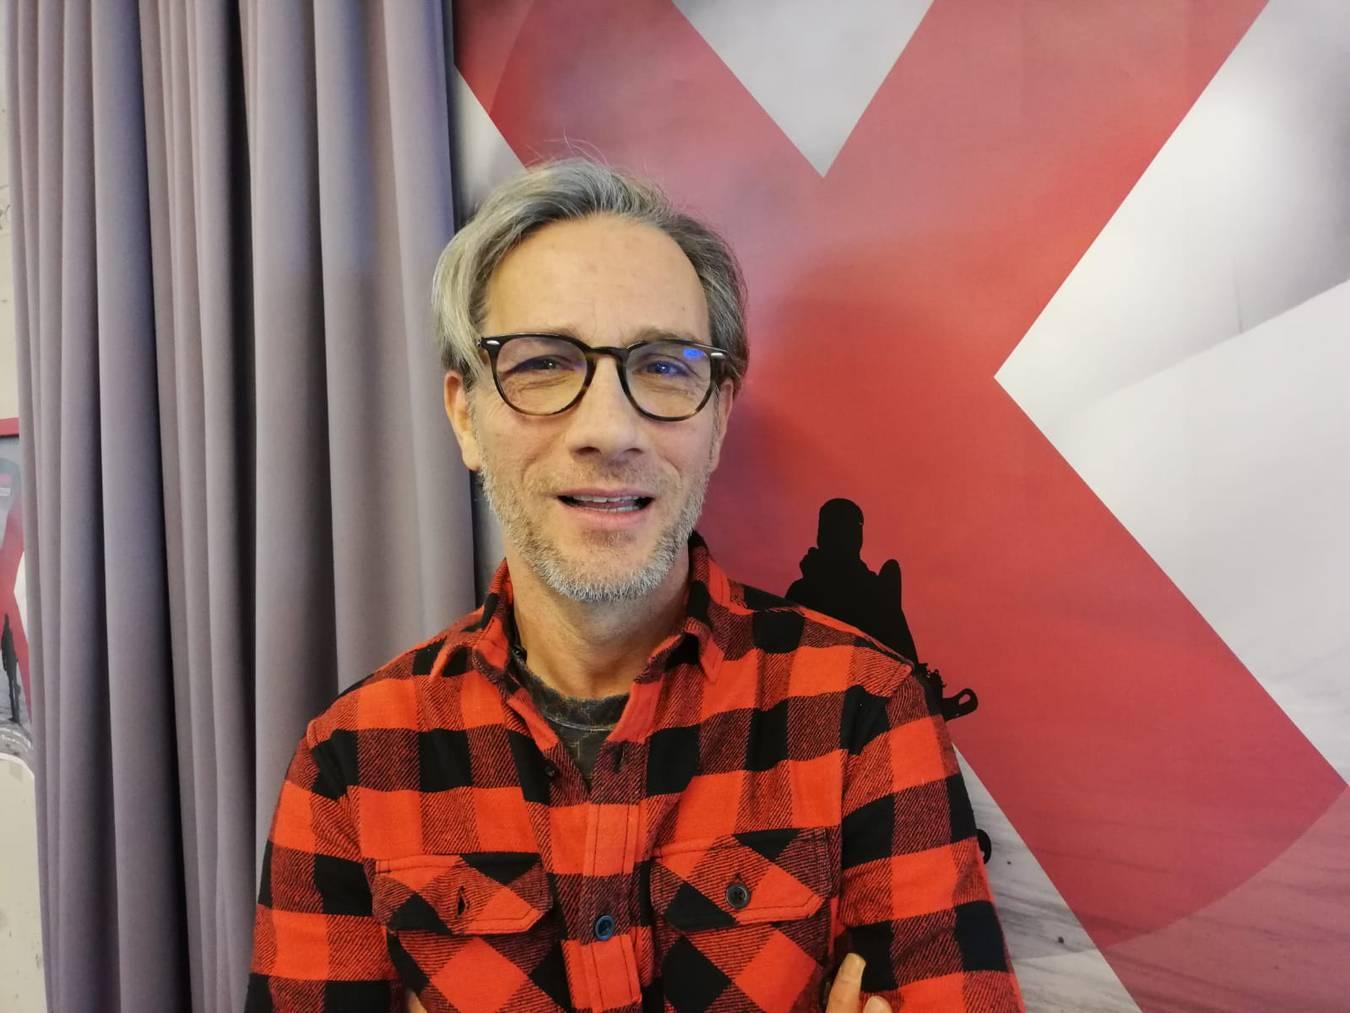 Donald Nader ist der Event Director des Laax Open. (Bild: FM1Today/NinaMüller)